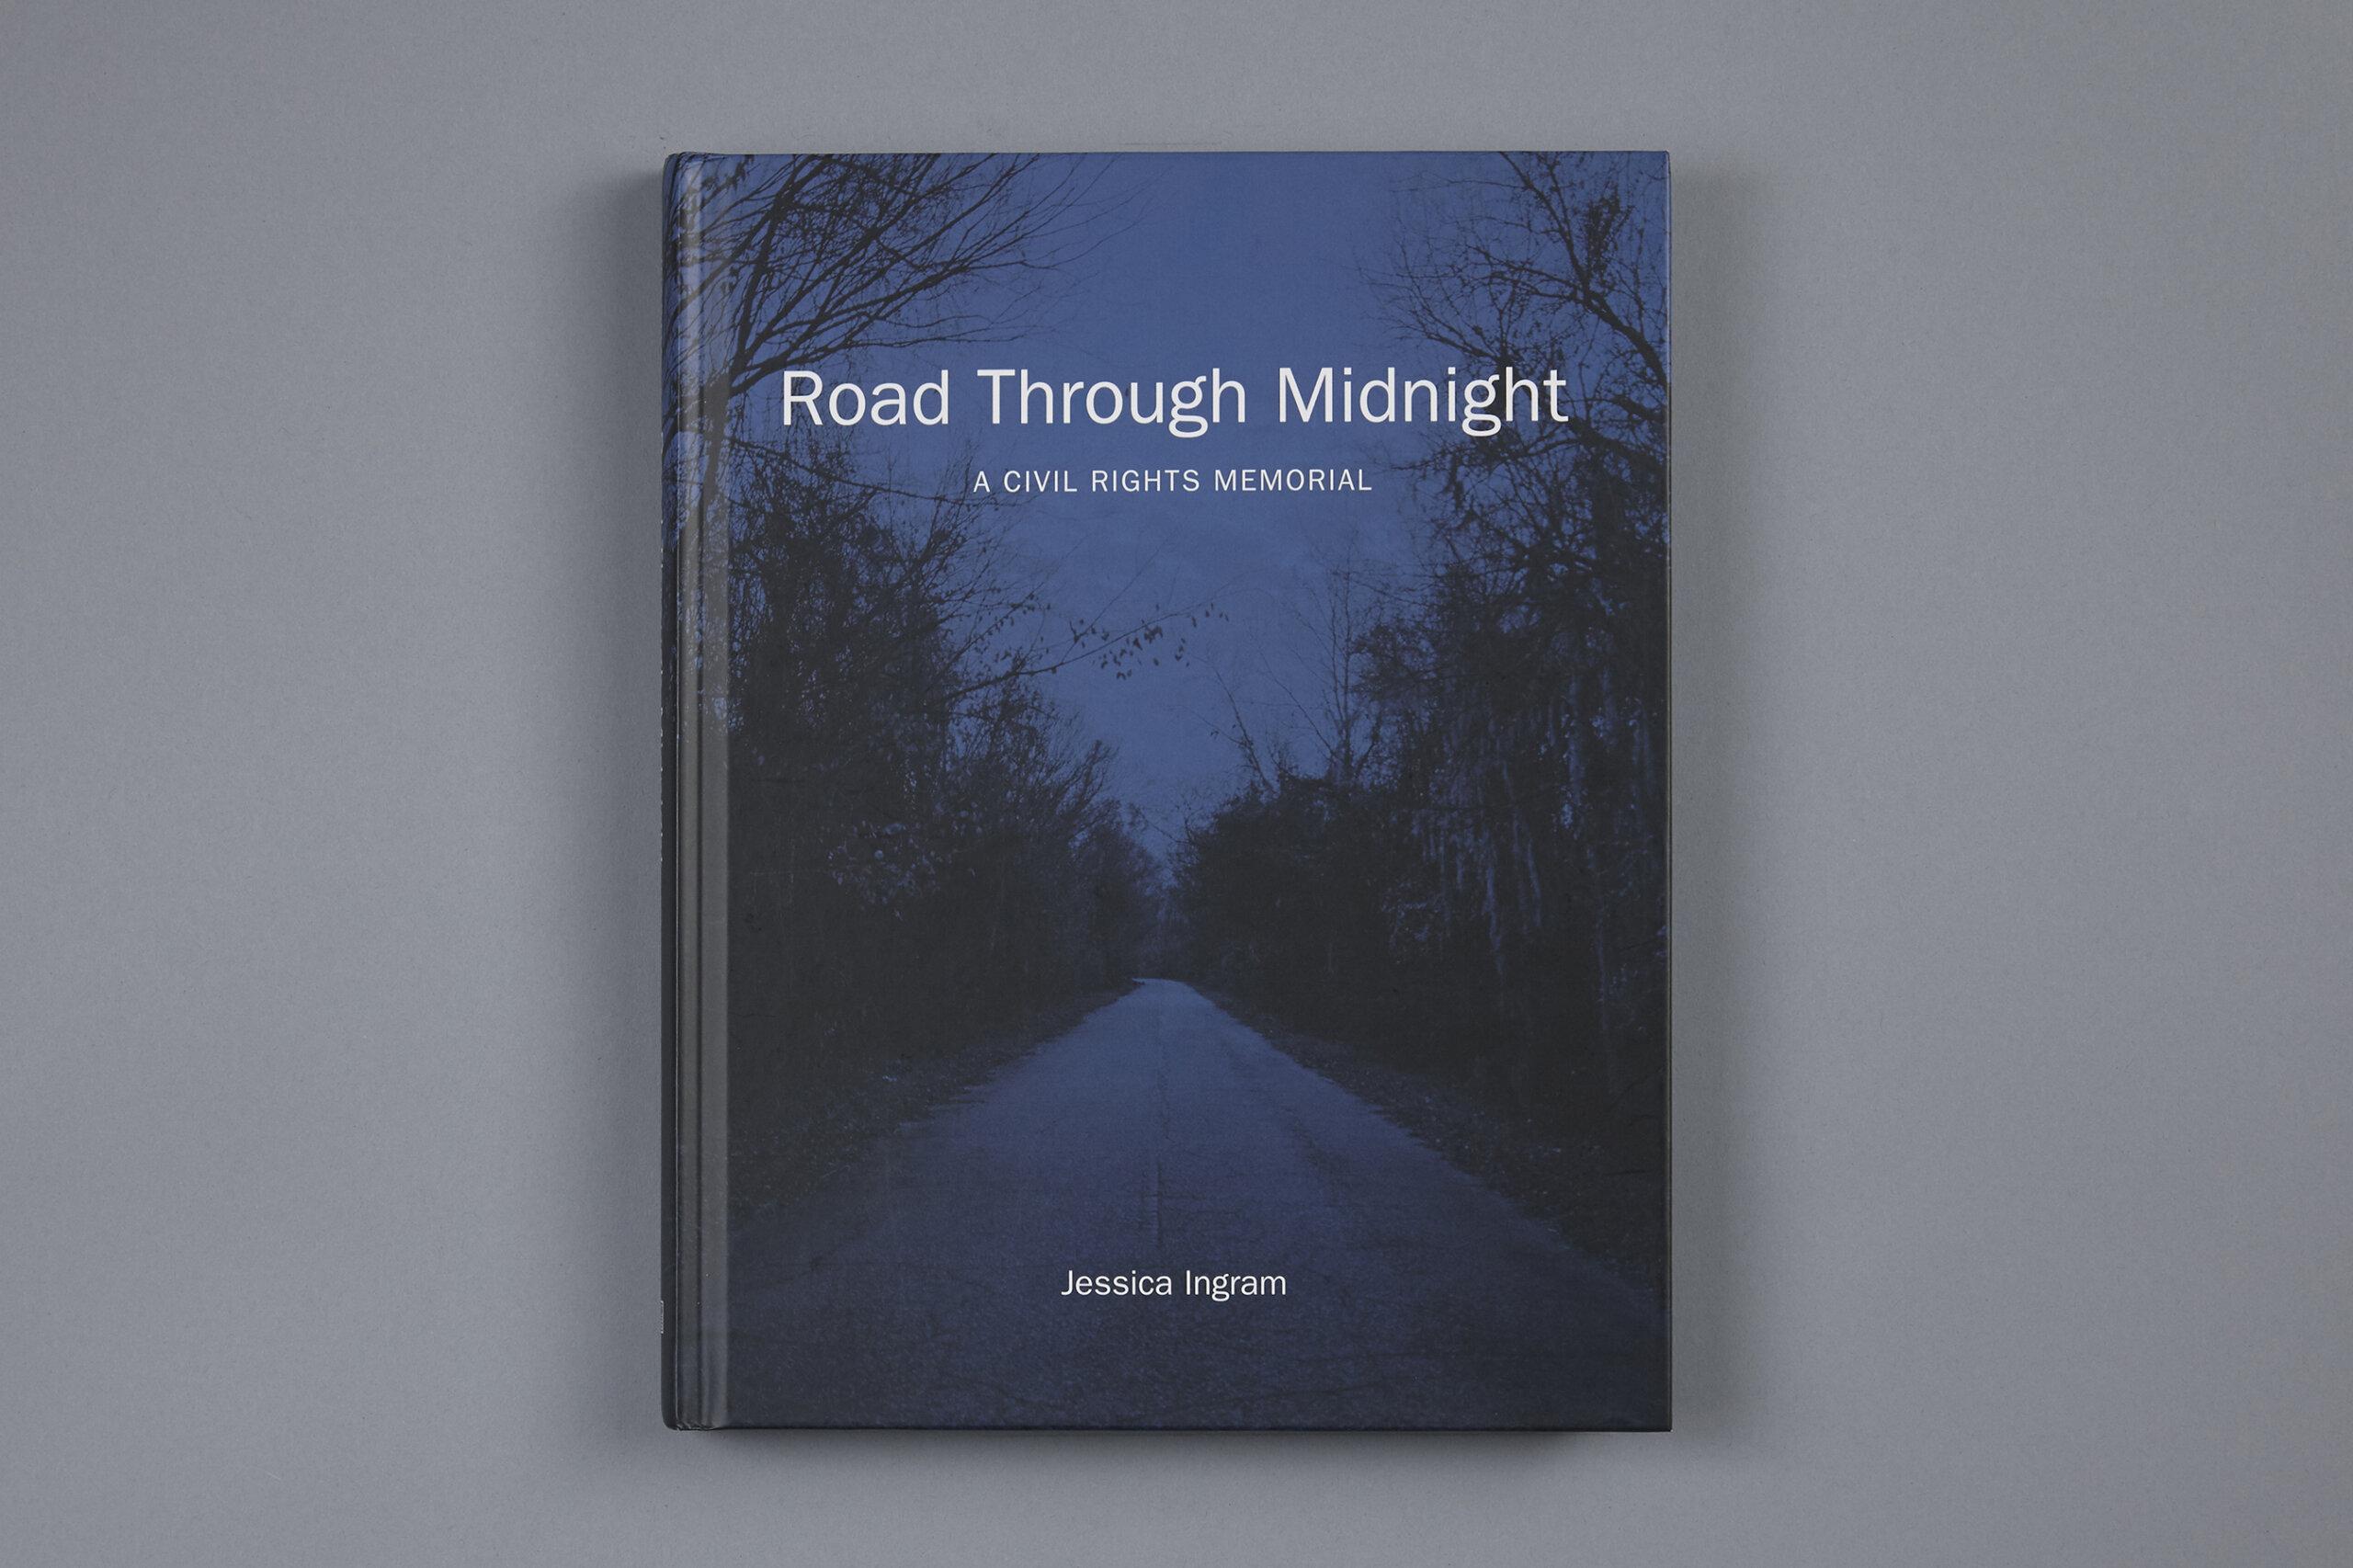 ingram-road-through-midnight-delpire-co-1